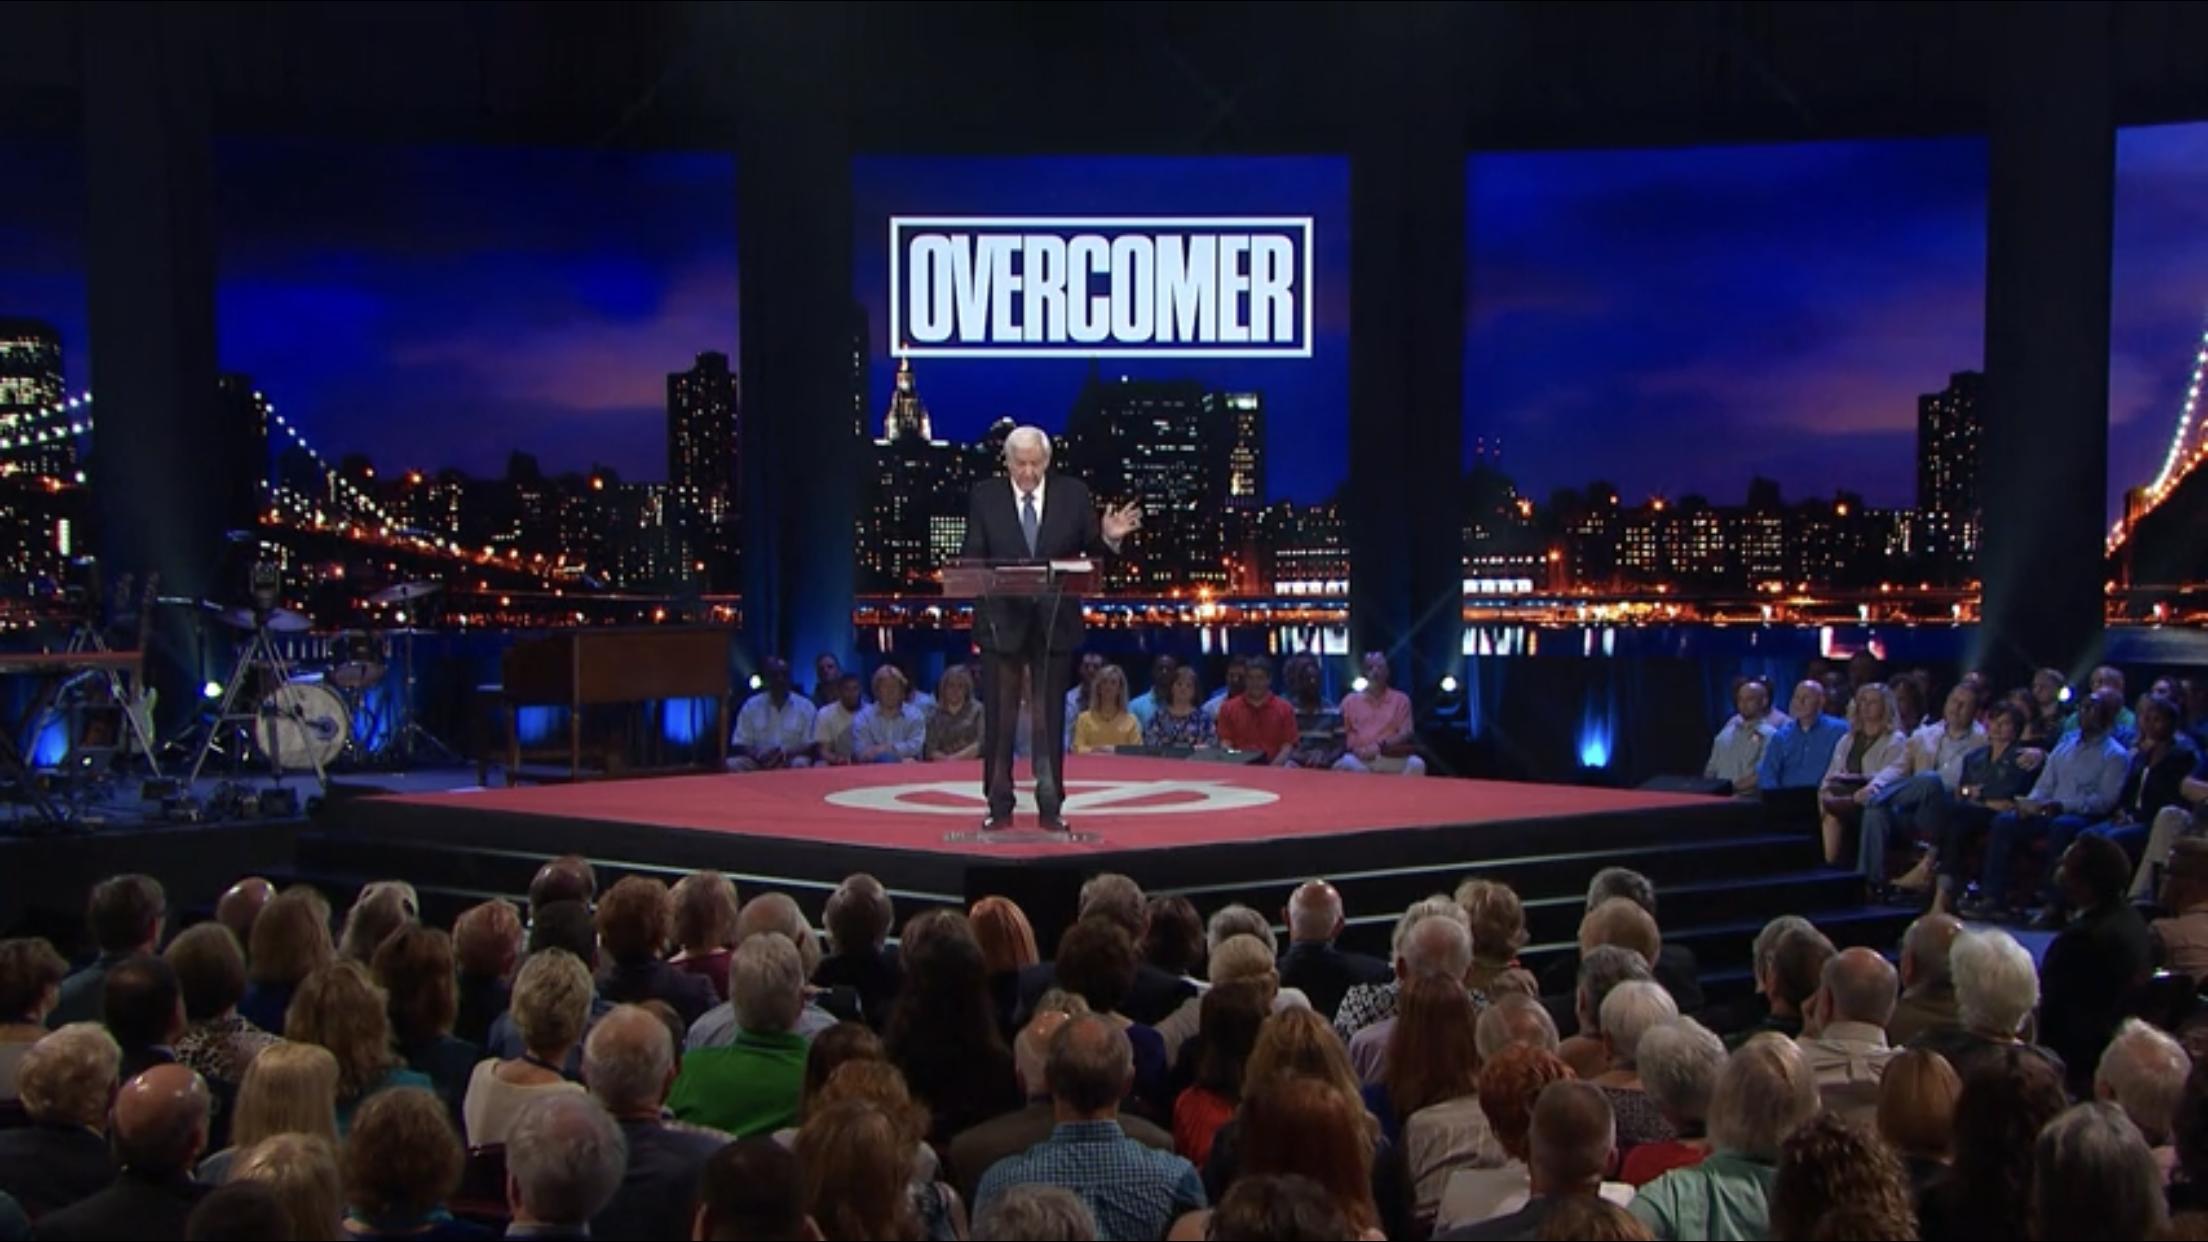 David Jeremiah -  Overcomer Tour